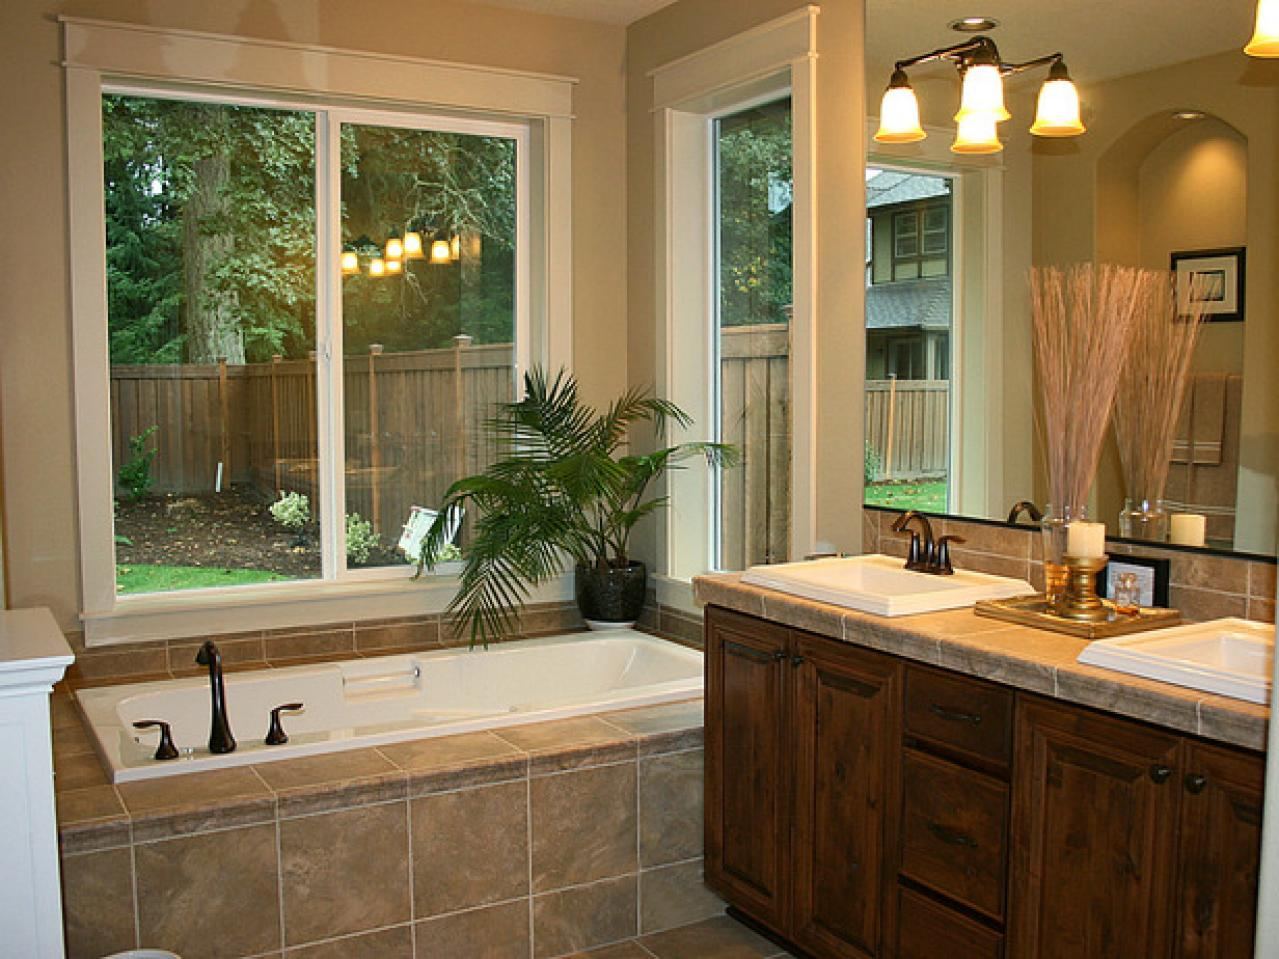 Transform Your Ordinary Bathroom to a Luxury Bathroom with ... on Master Bathroom Remodel Ideas  id=30730